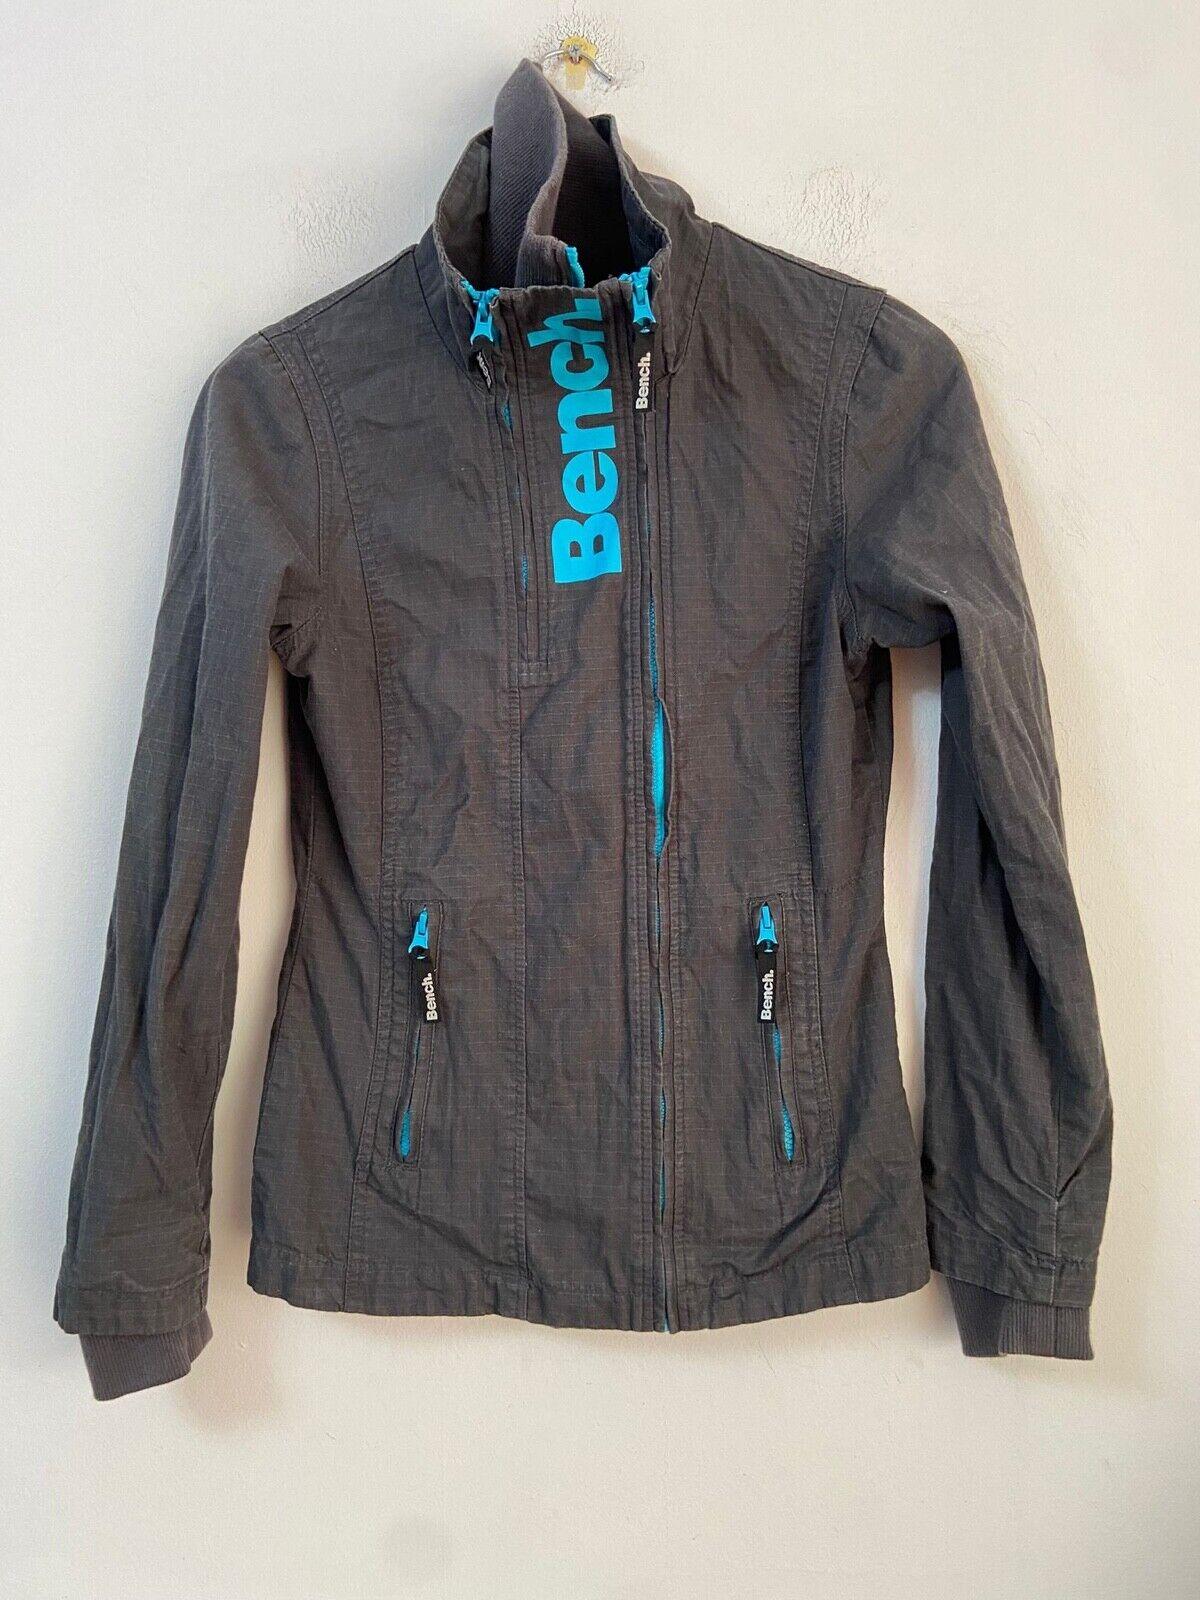 Bench Grey Jacket Size XS Womens Long Sleeve (N769)